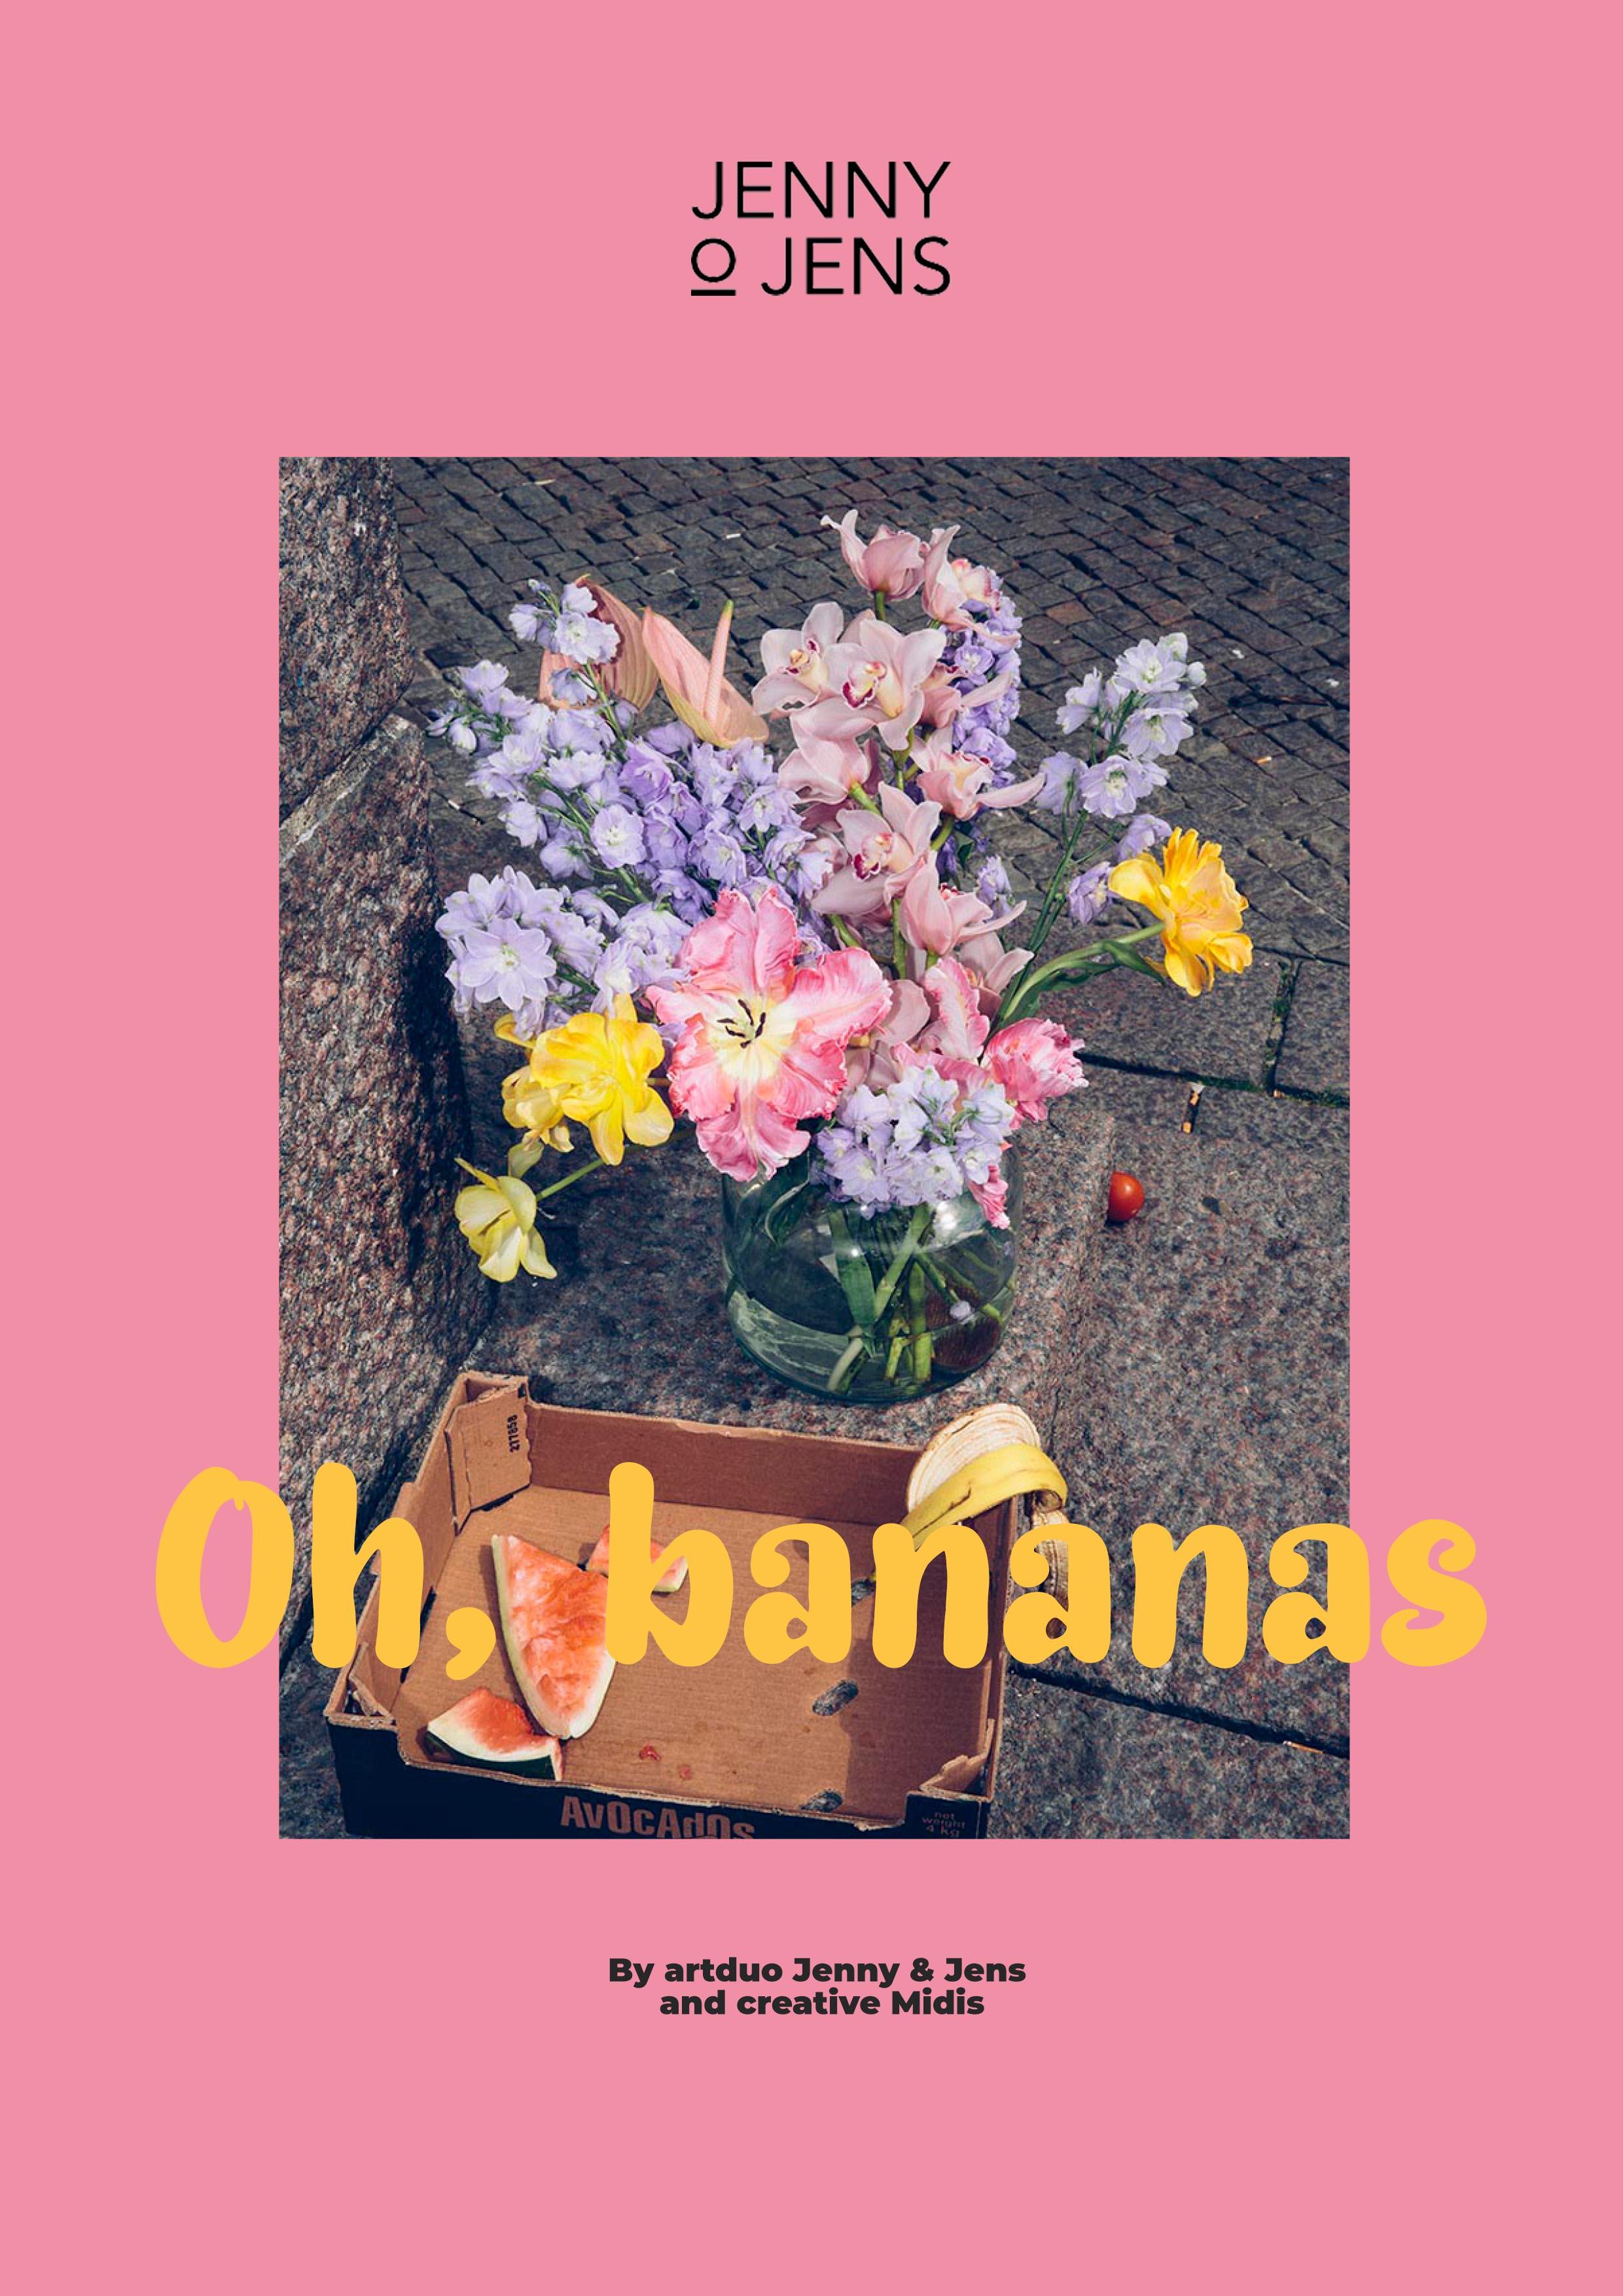 Oh, bananas - a flowerful artprint